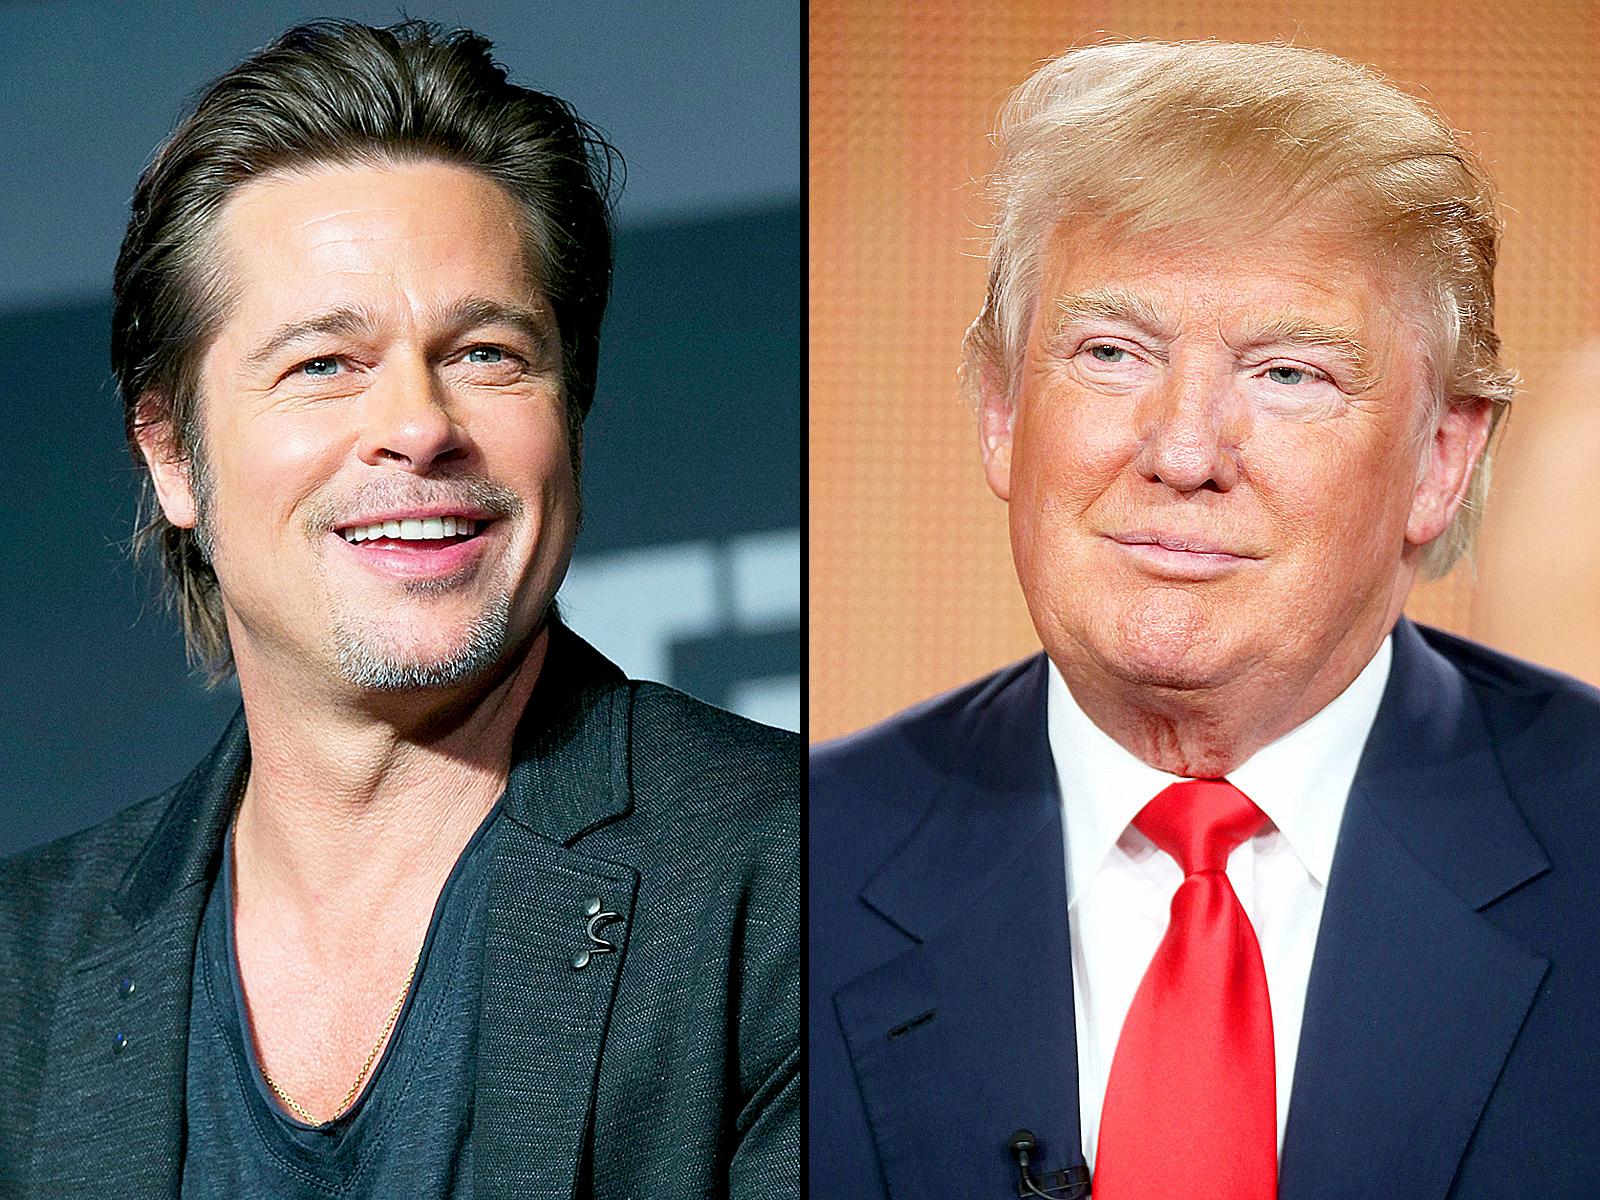 Brad Pitt and Donald Trump